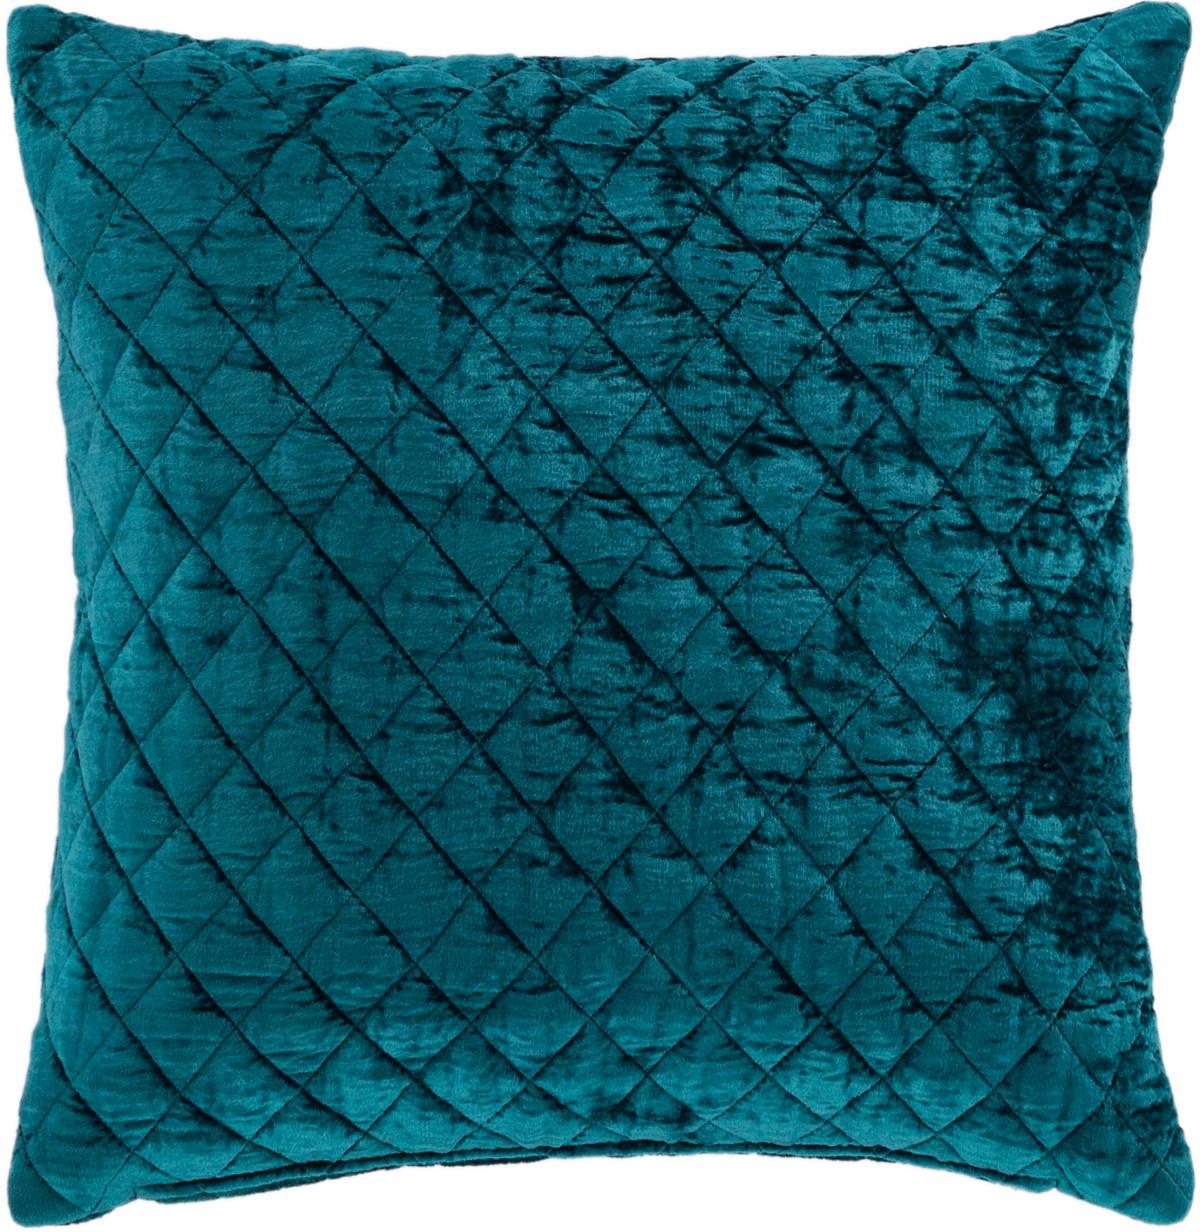 Patina Velvet Juniper Decorative Pillow